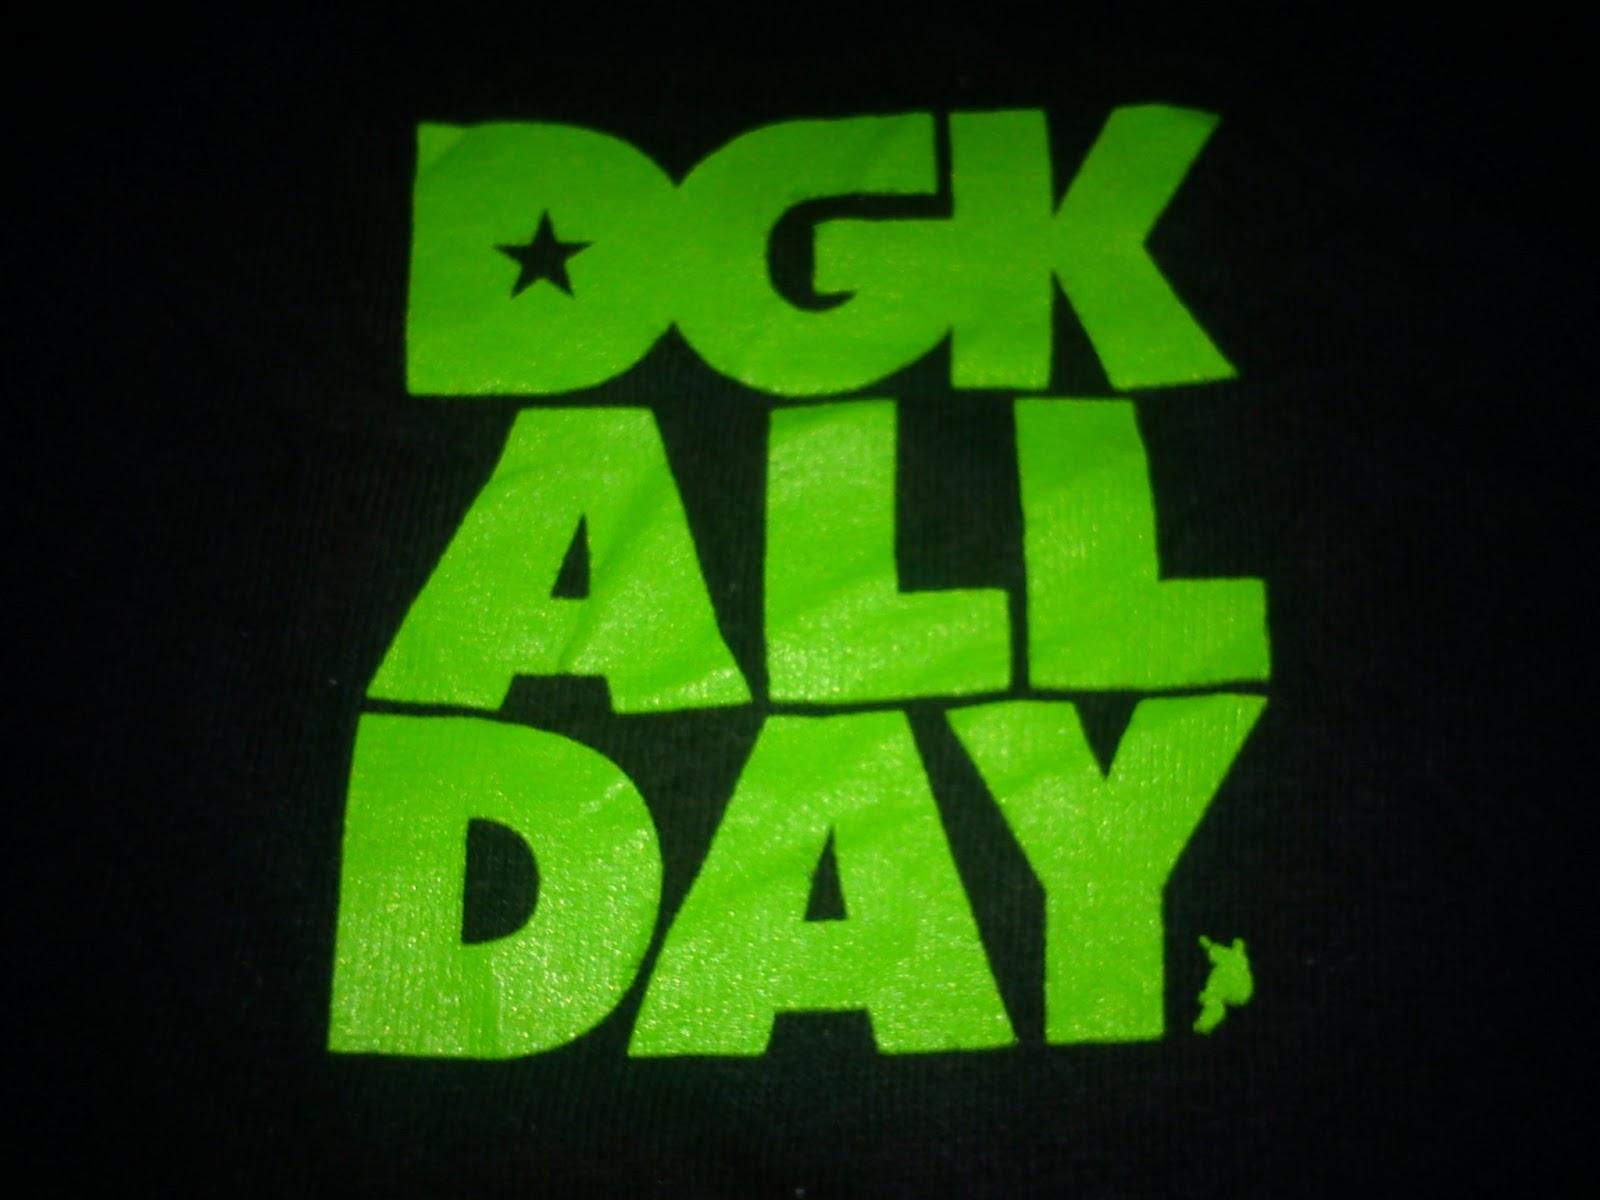 Dgk Wallpaper wl 1678 dgk all day by the 1600x1200